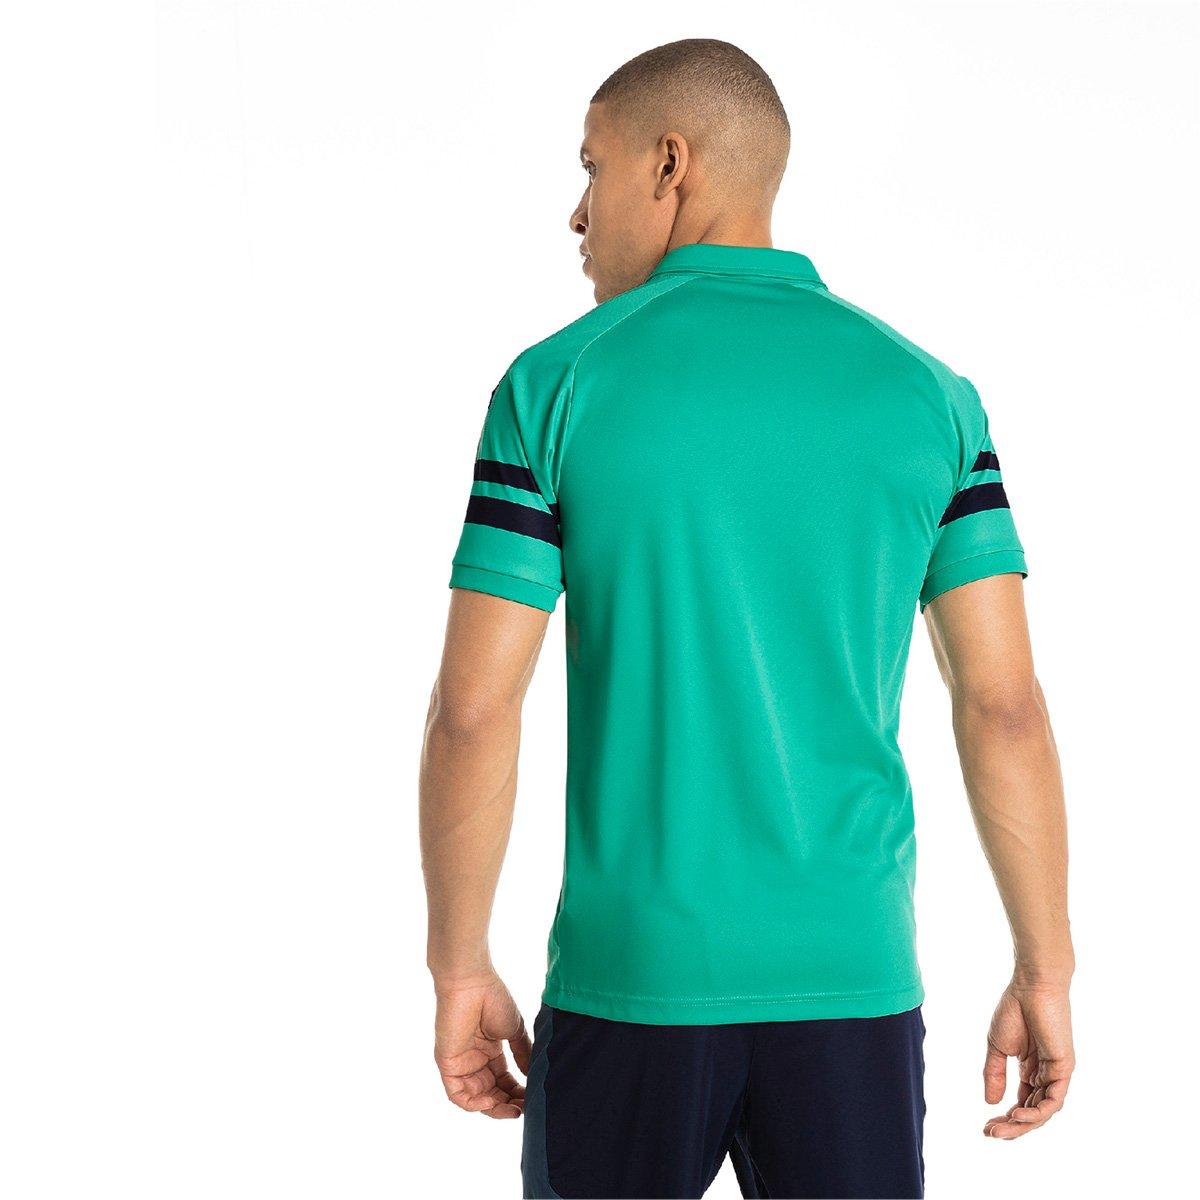 Camisa Arsenal Third 2018 s n° - Torcedor Puma Masculina - Verde ... db50f90eac6ff